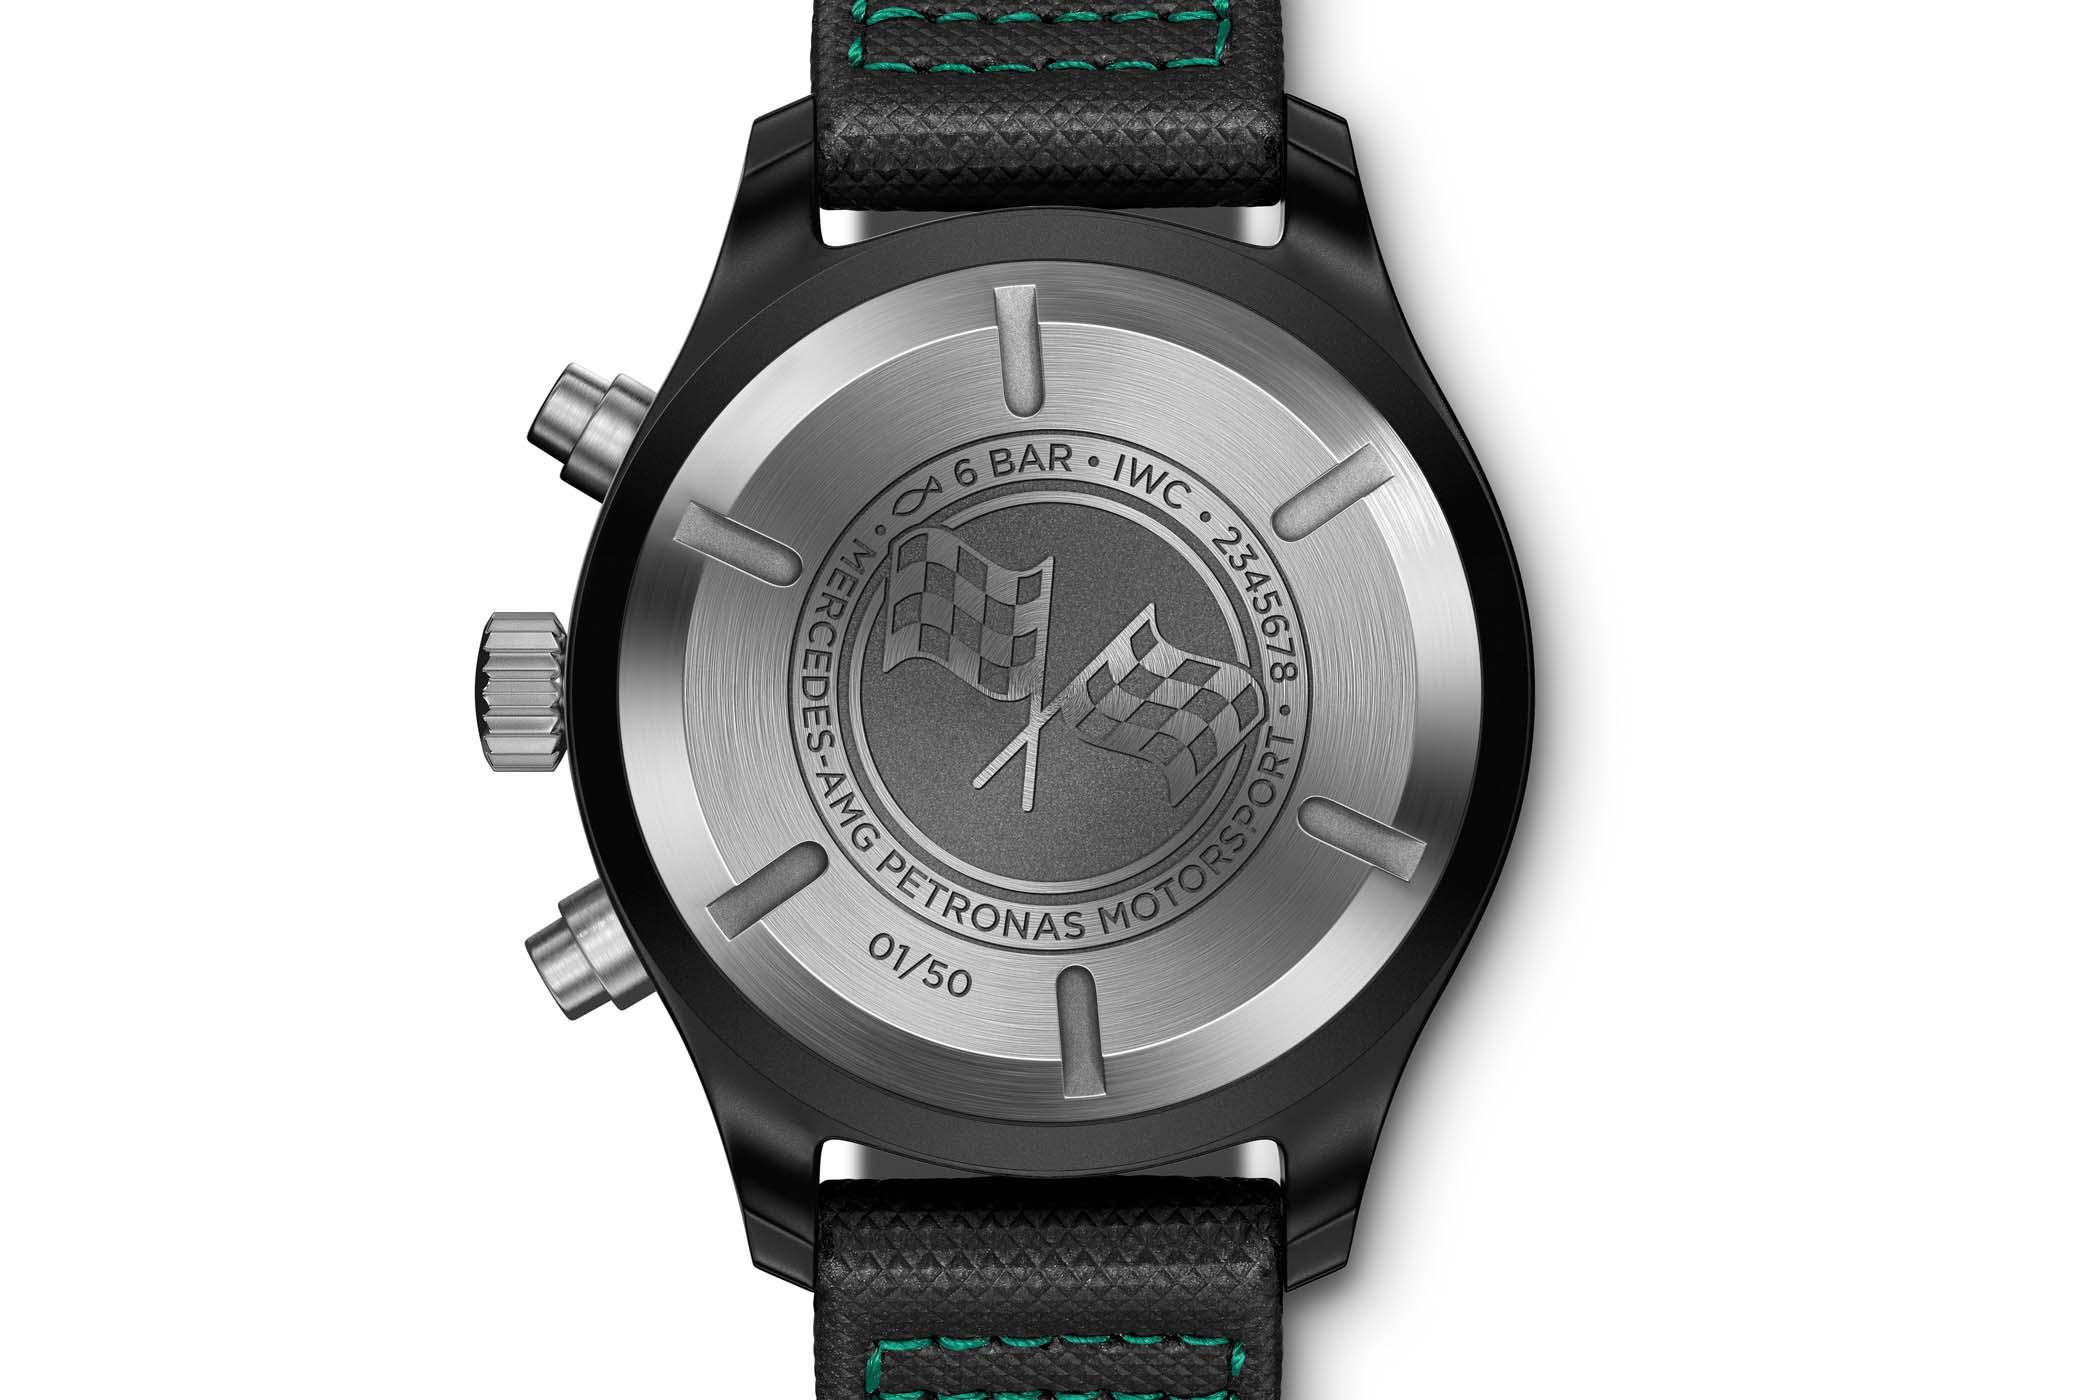 IWC Pilot's Watch Chronograph Mercedes-AMG Petronas Motorsport IW389005